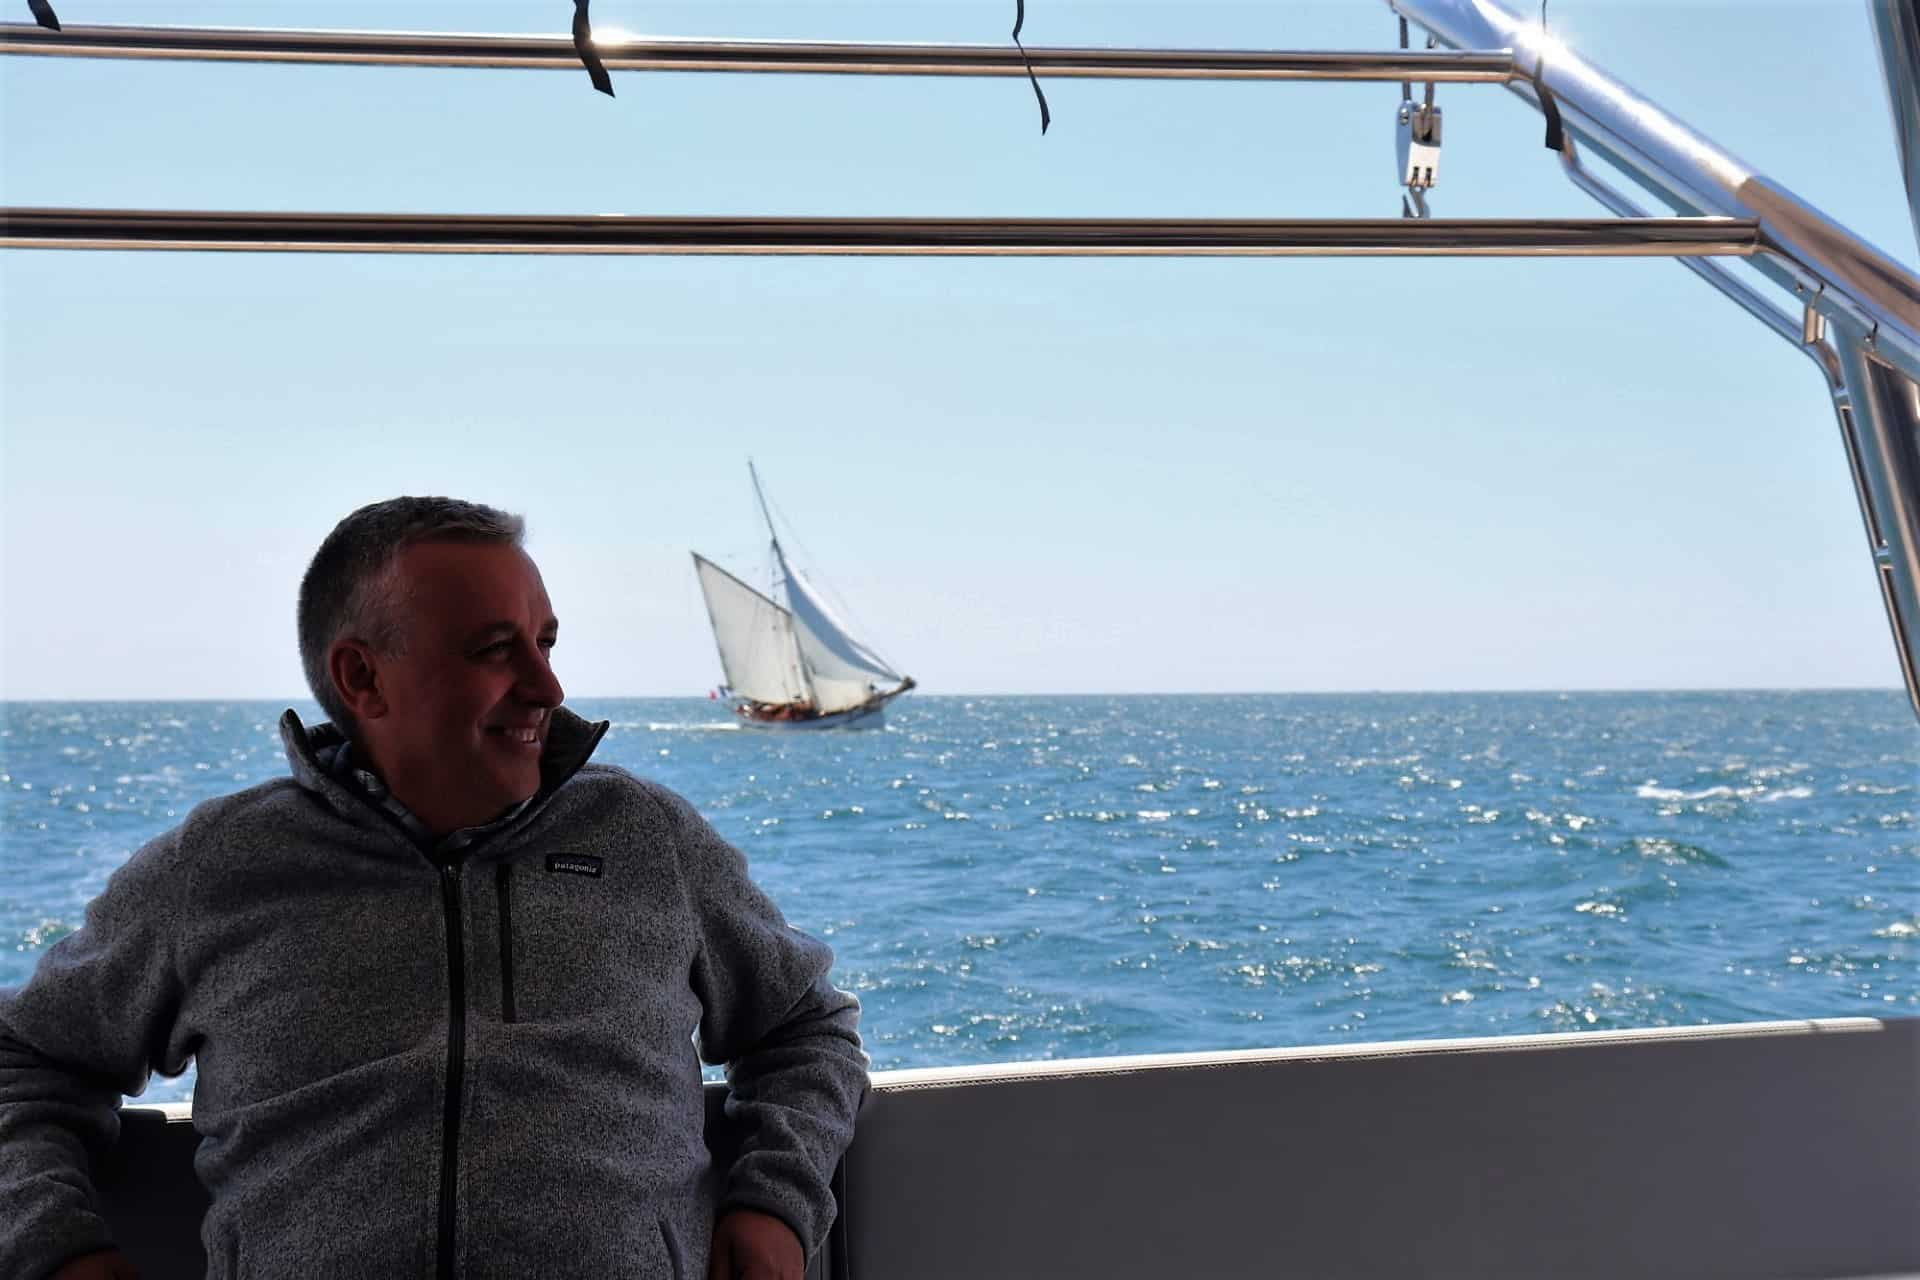 Rob just enjoying his new boat.